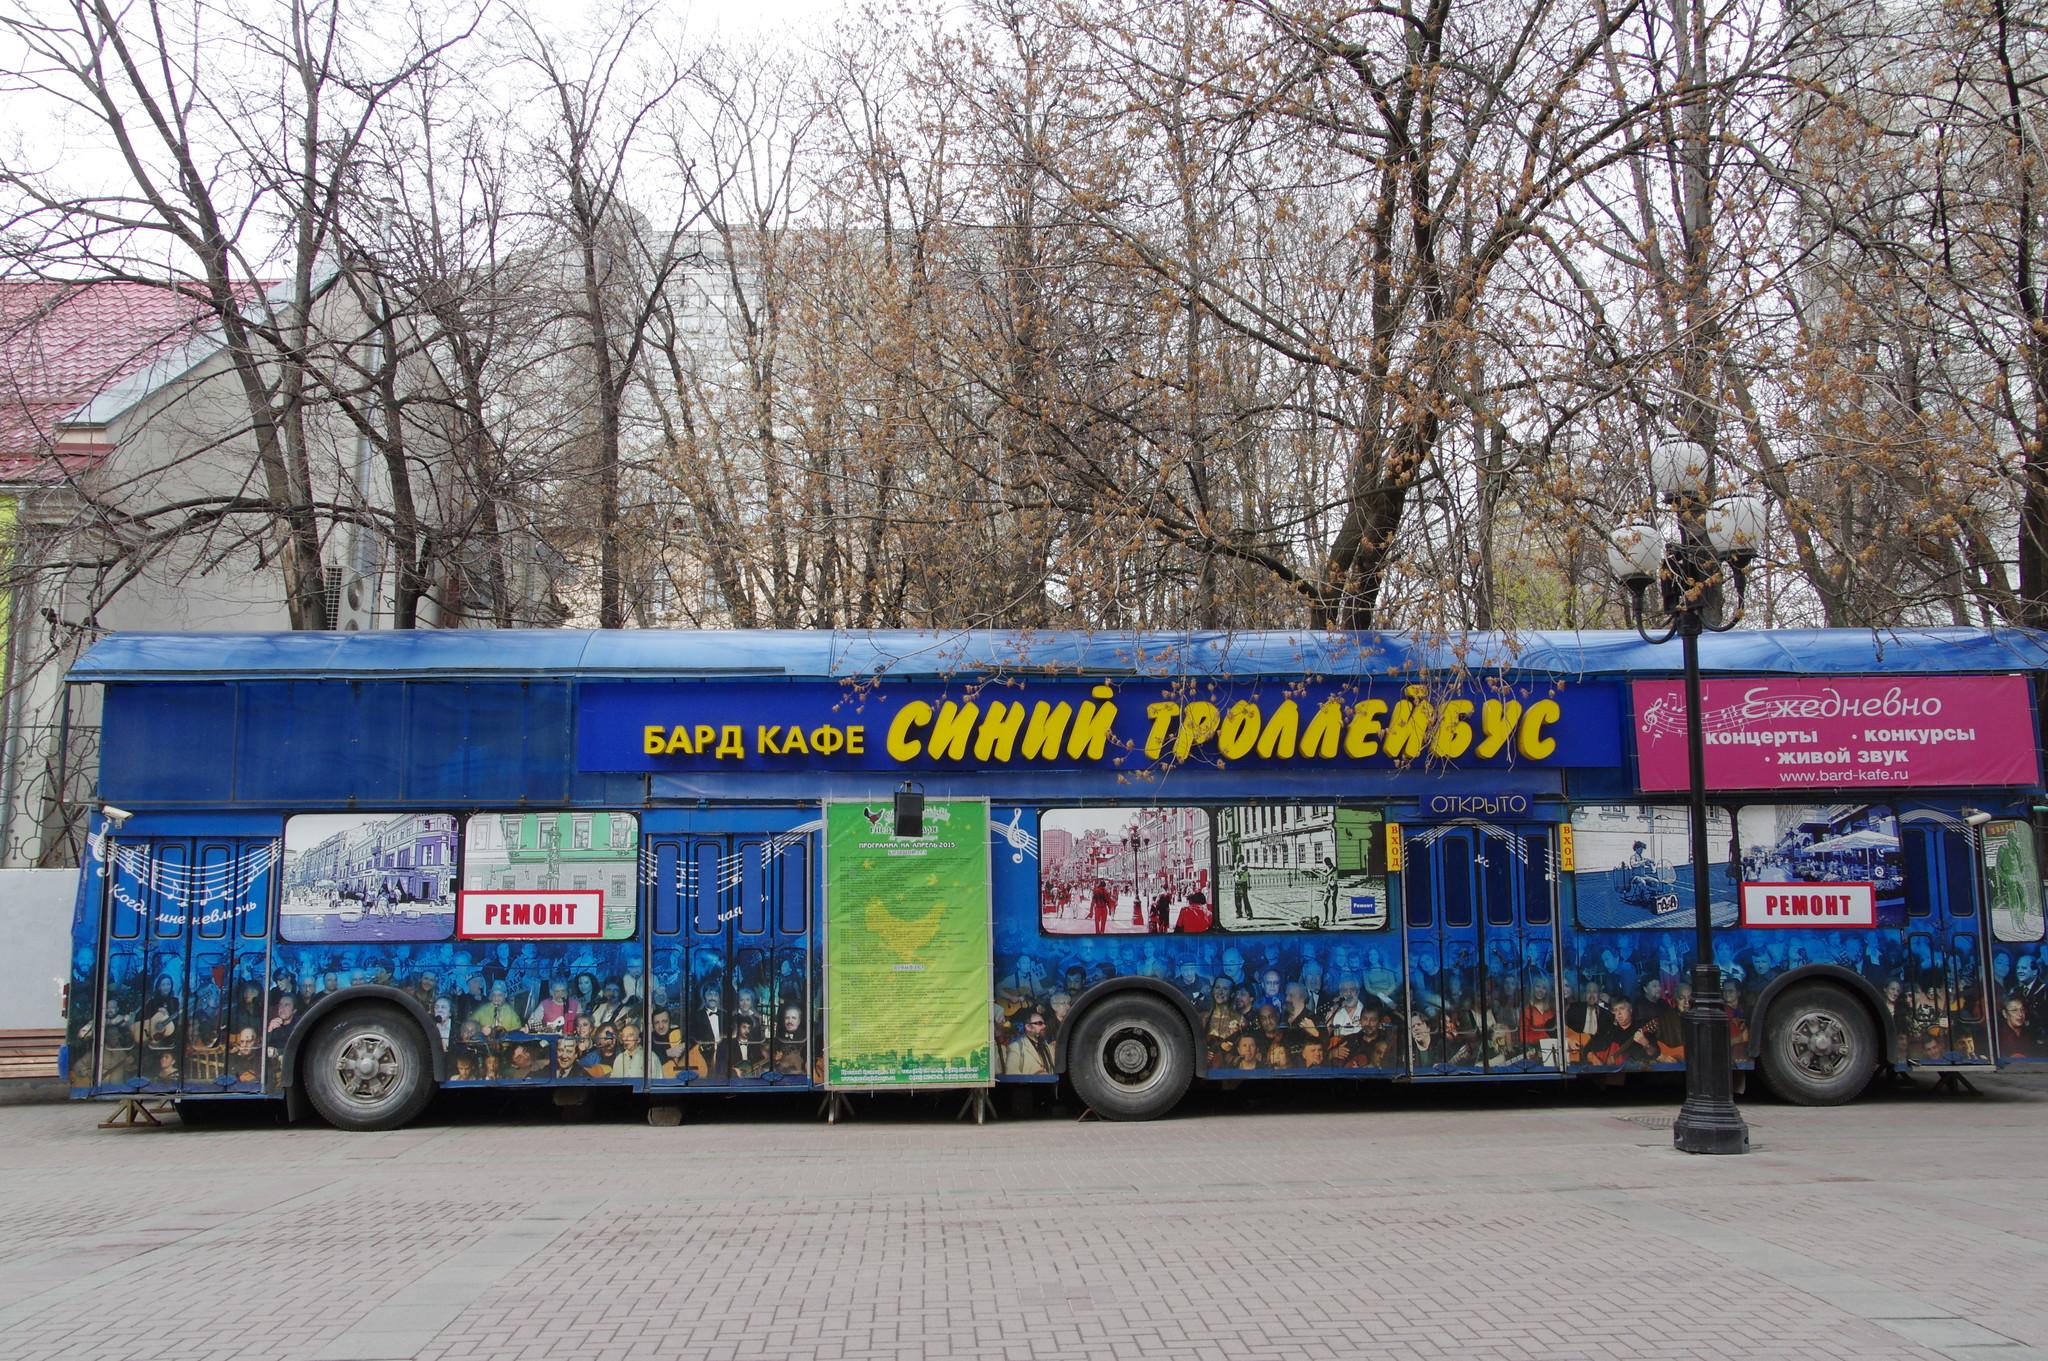 Бард-кафе «Синий троллейбус» на Арбате